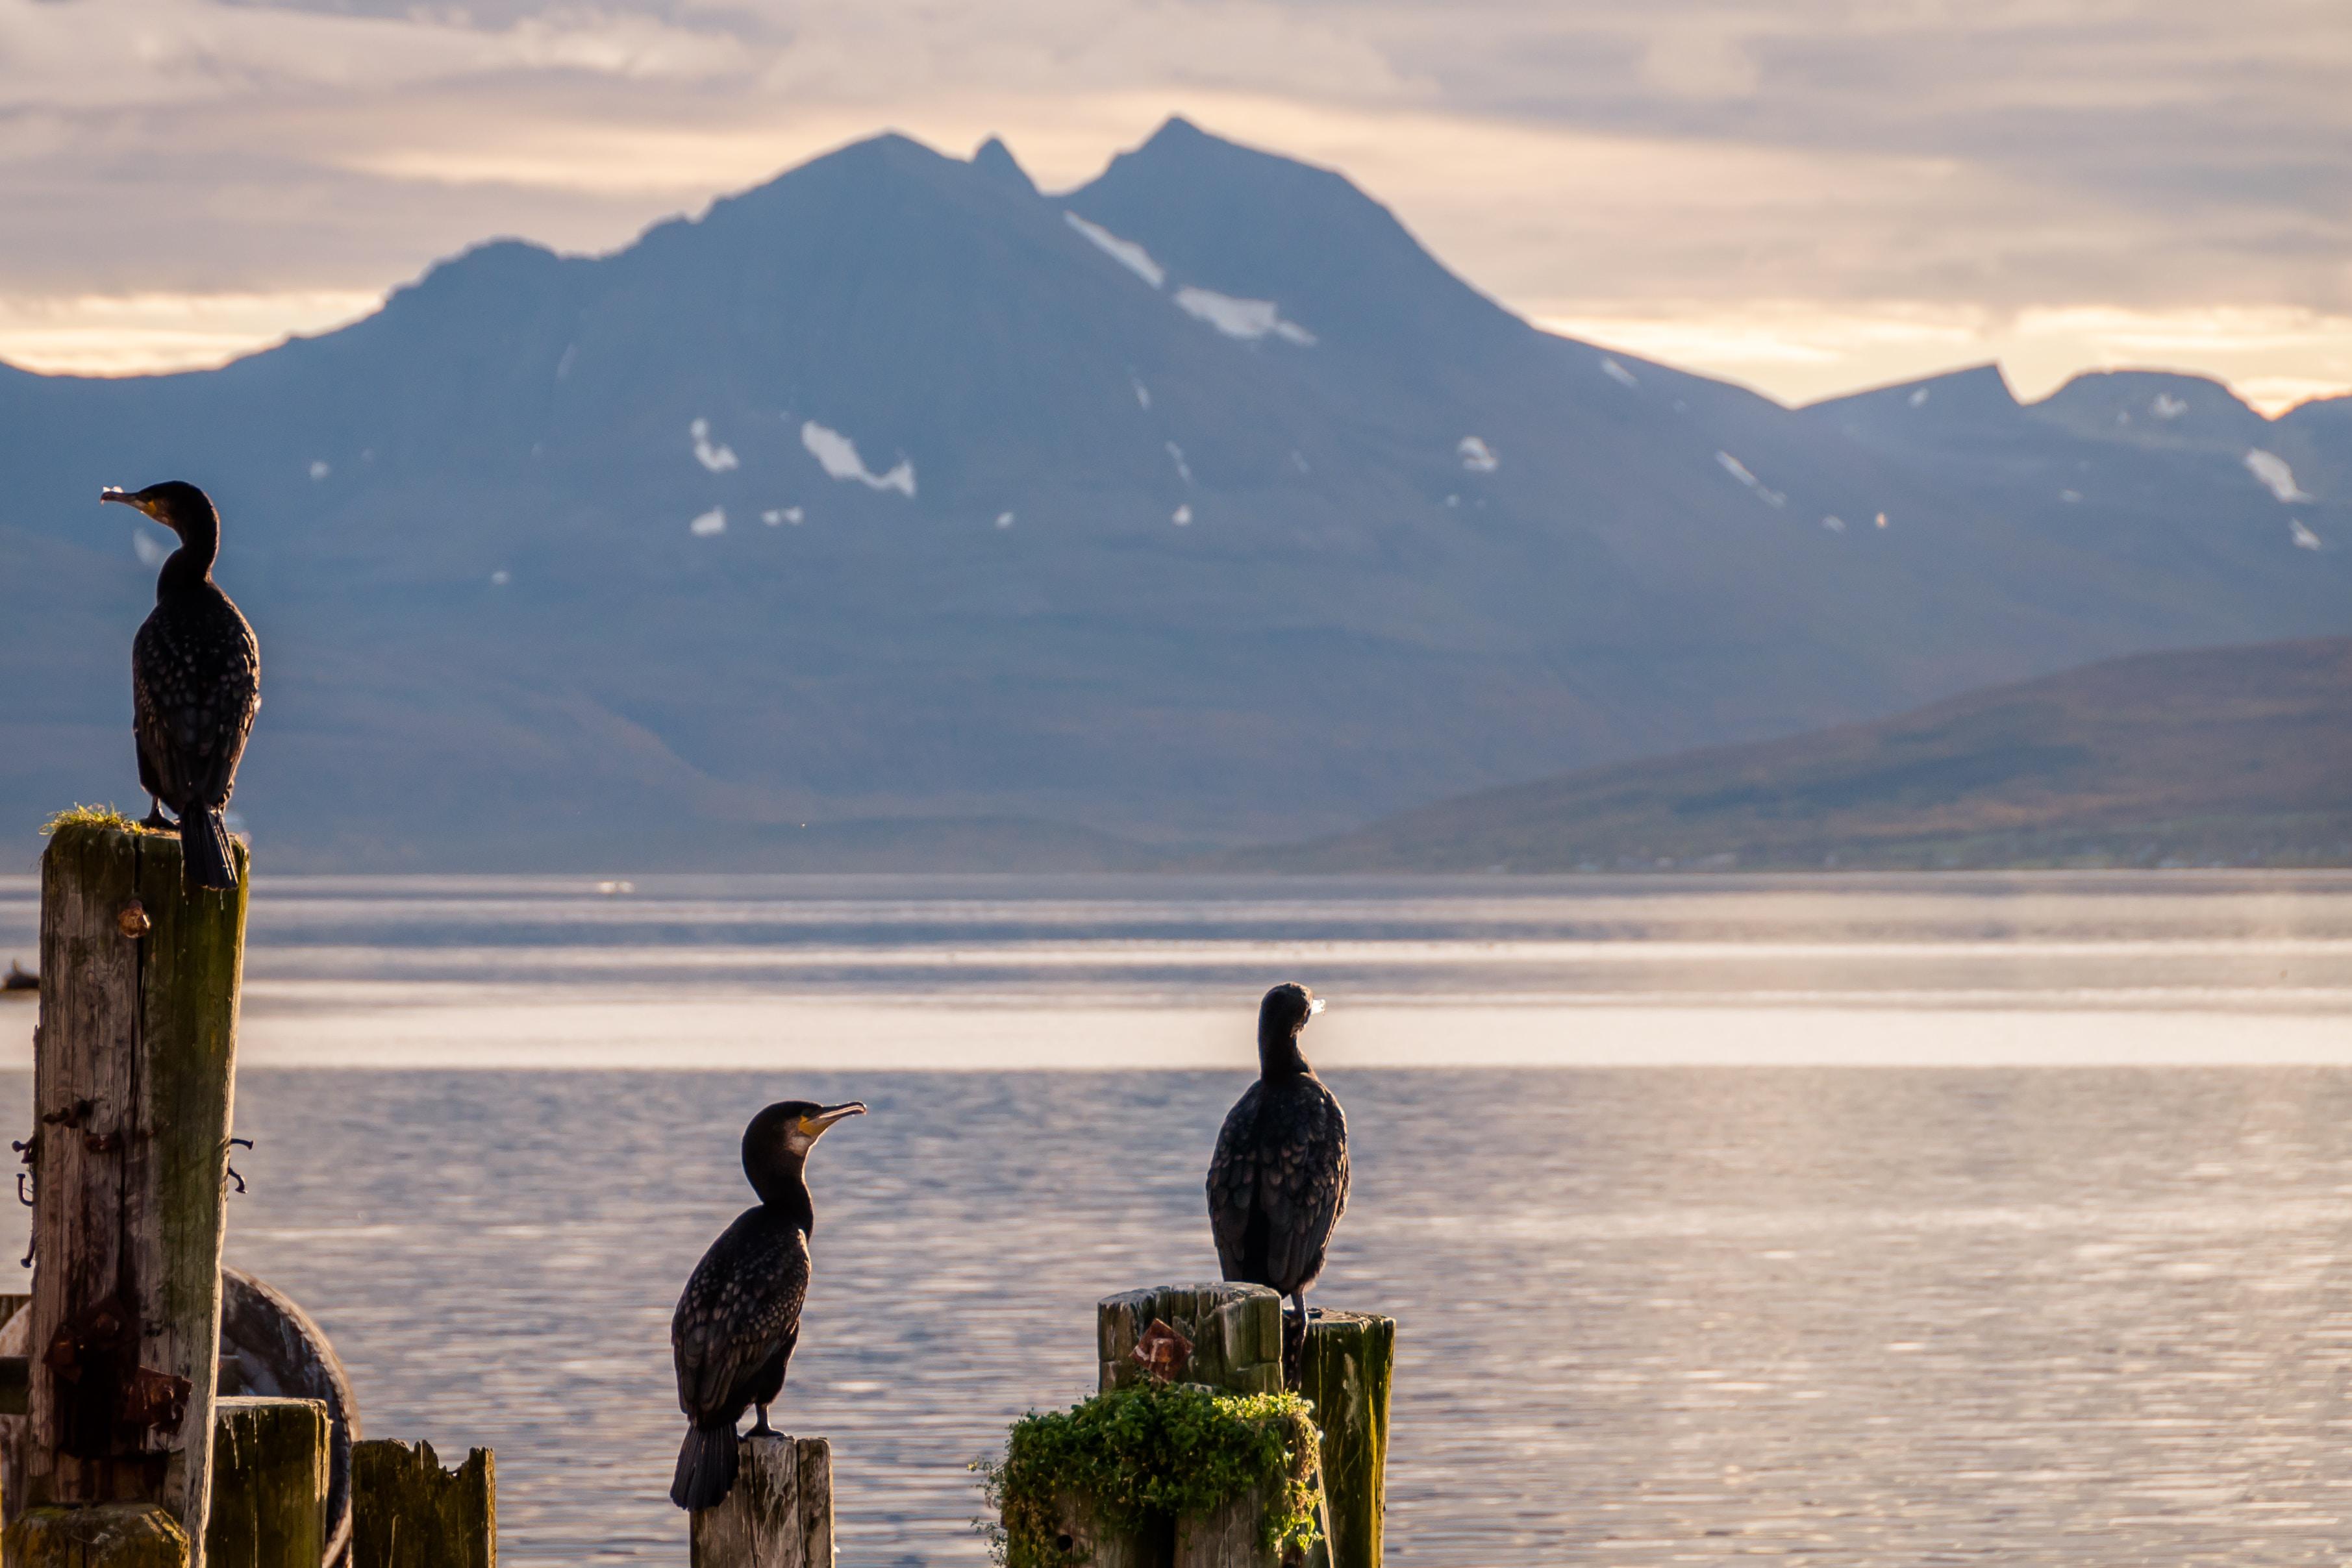 three birds on wood posts during daytime